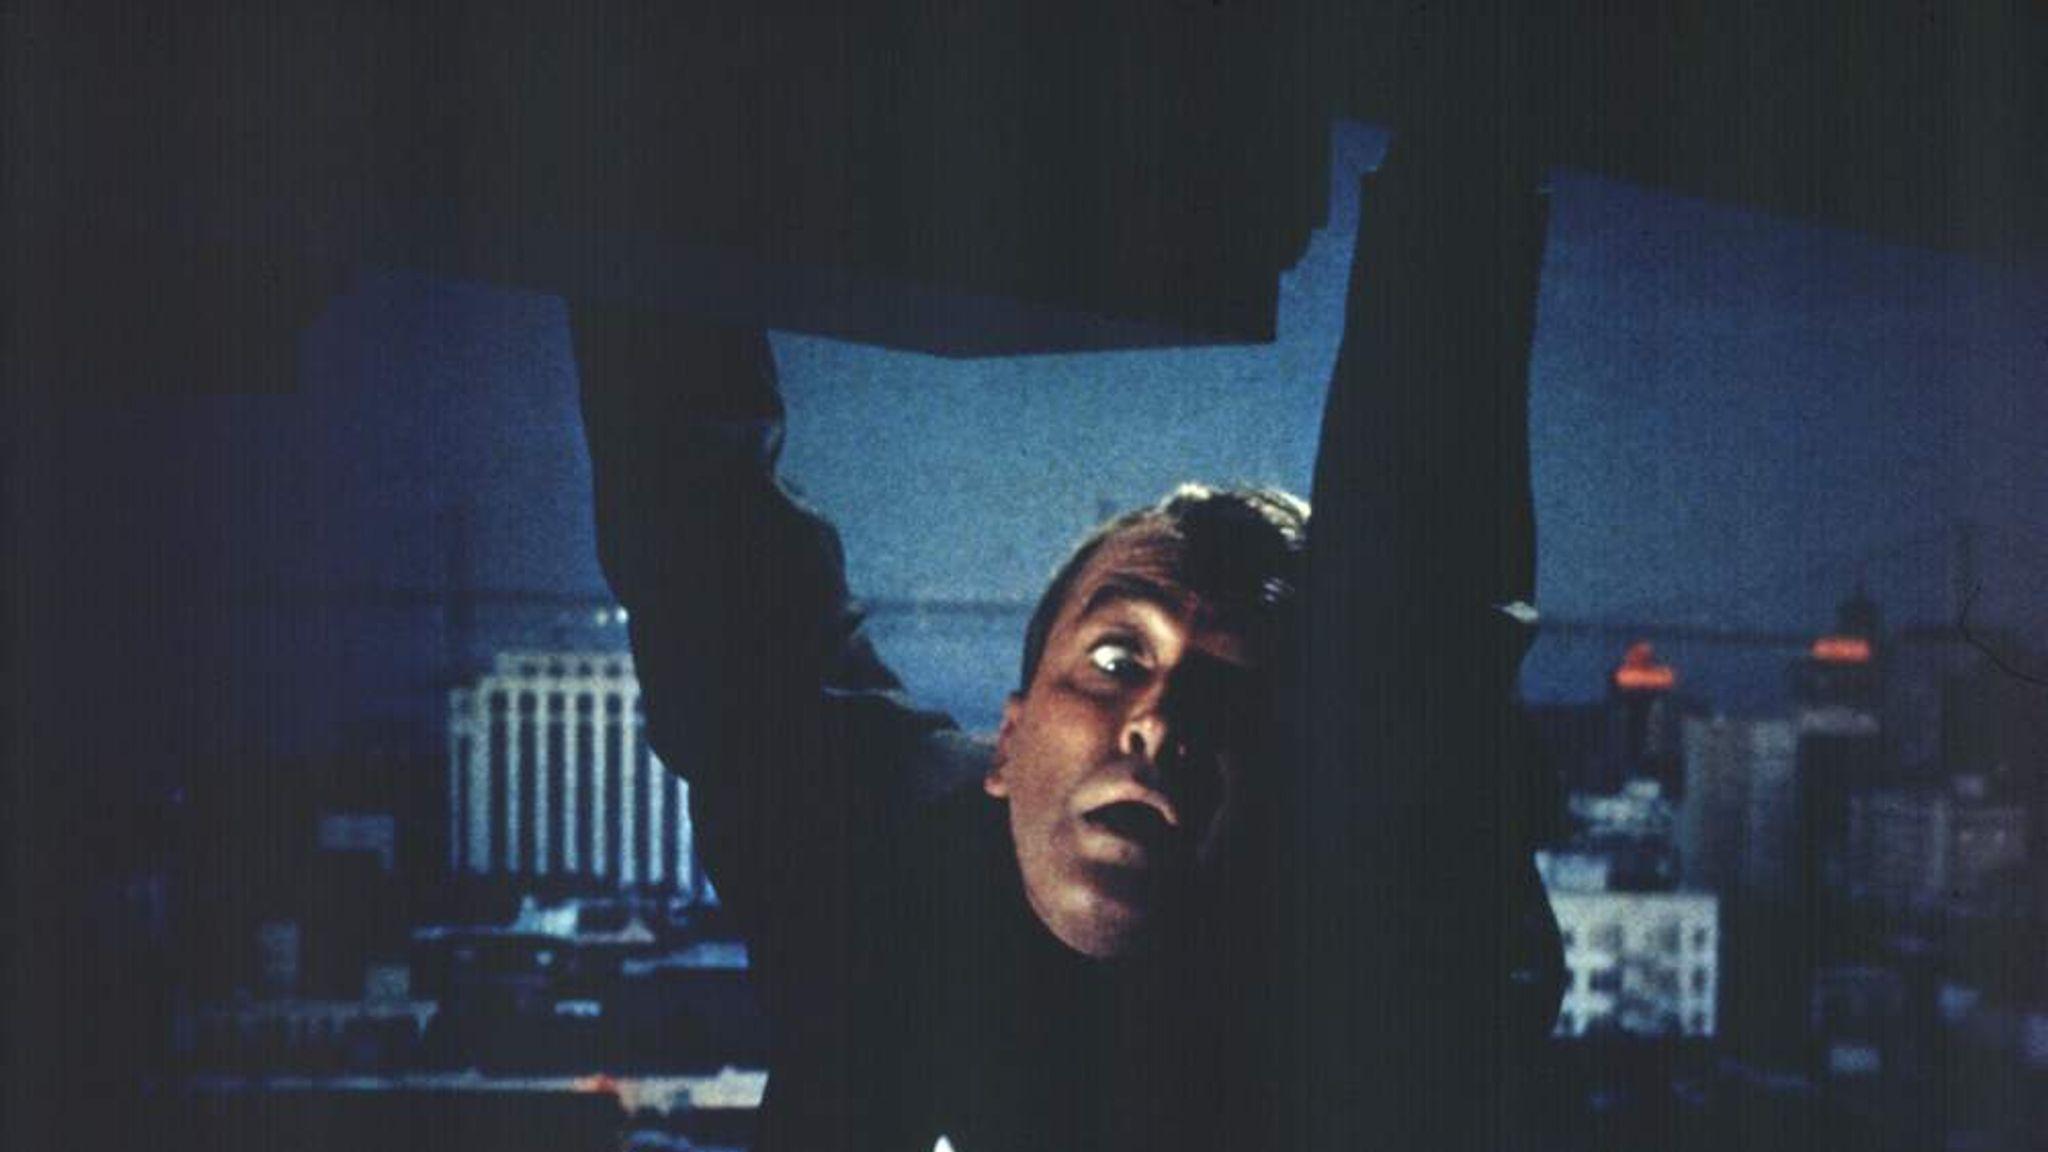 Hitchcock Film Vertigo Voted Best Of All Time Ents Arts